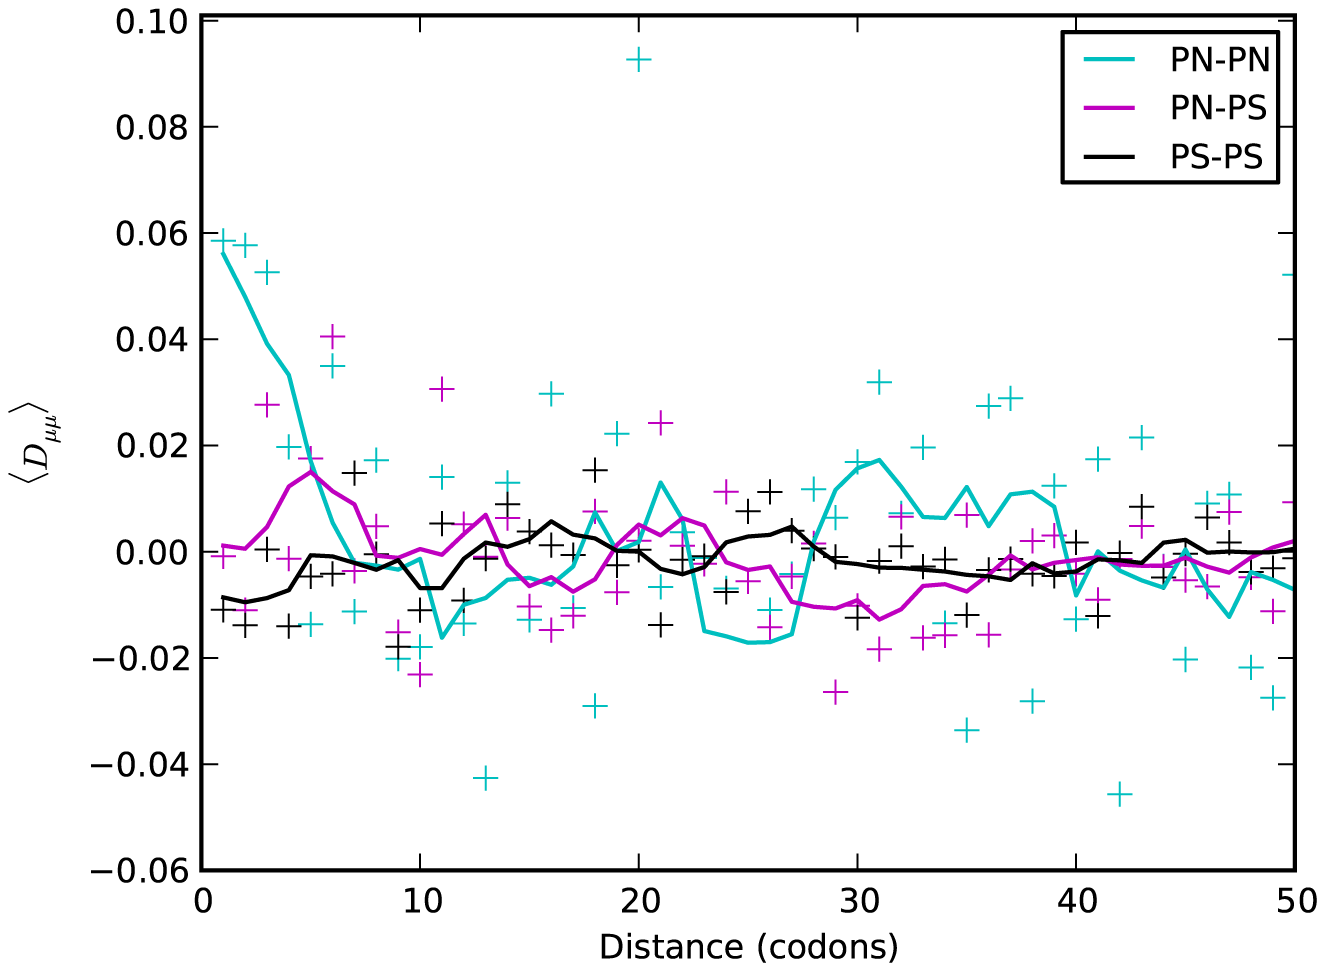 Polarized linkage disequilibrium.